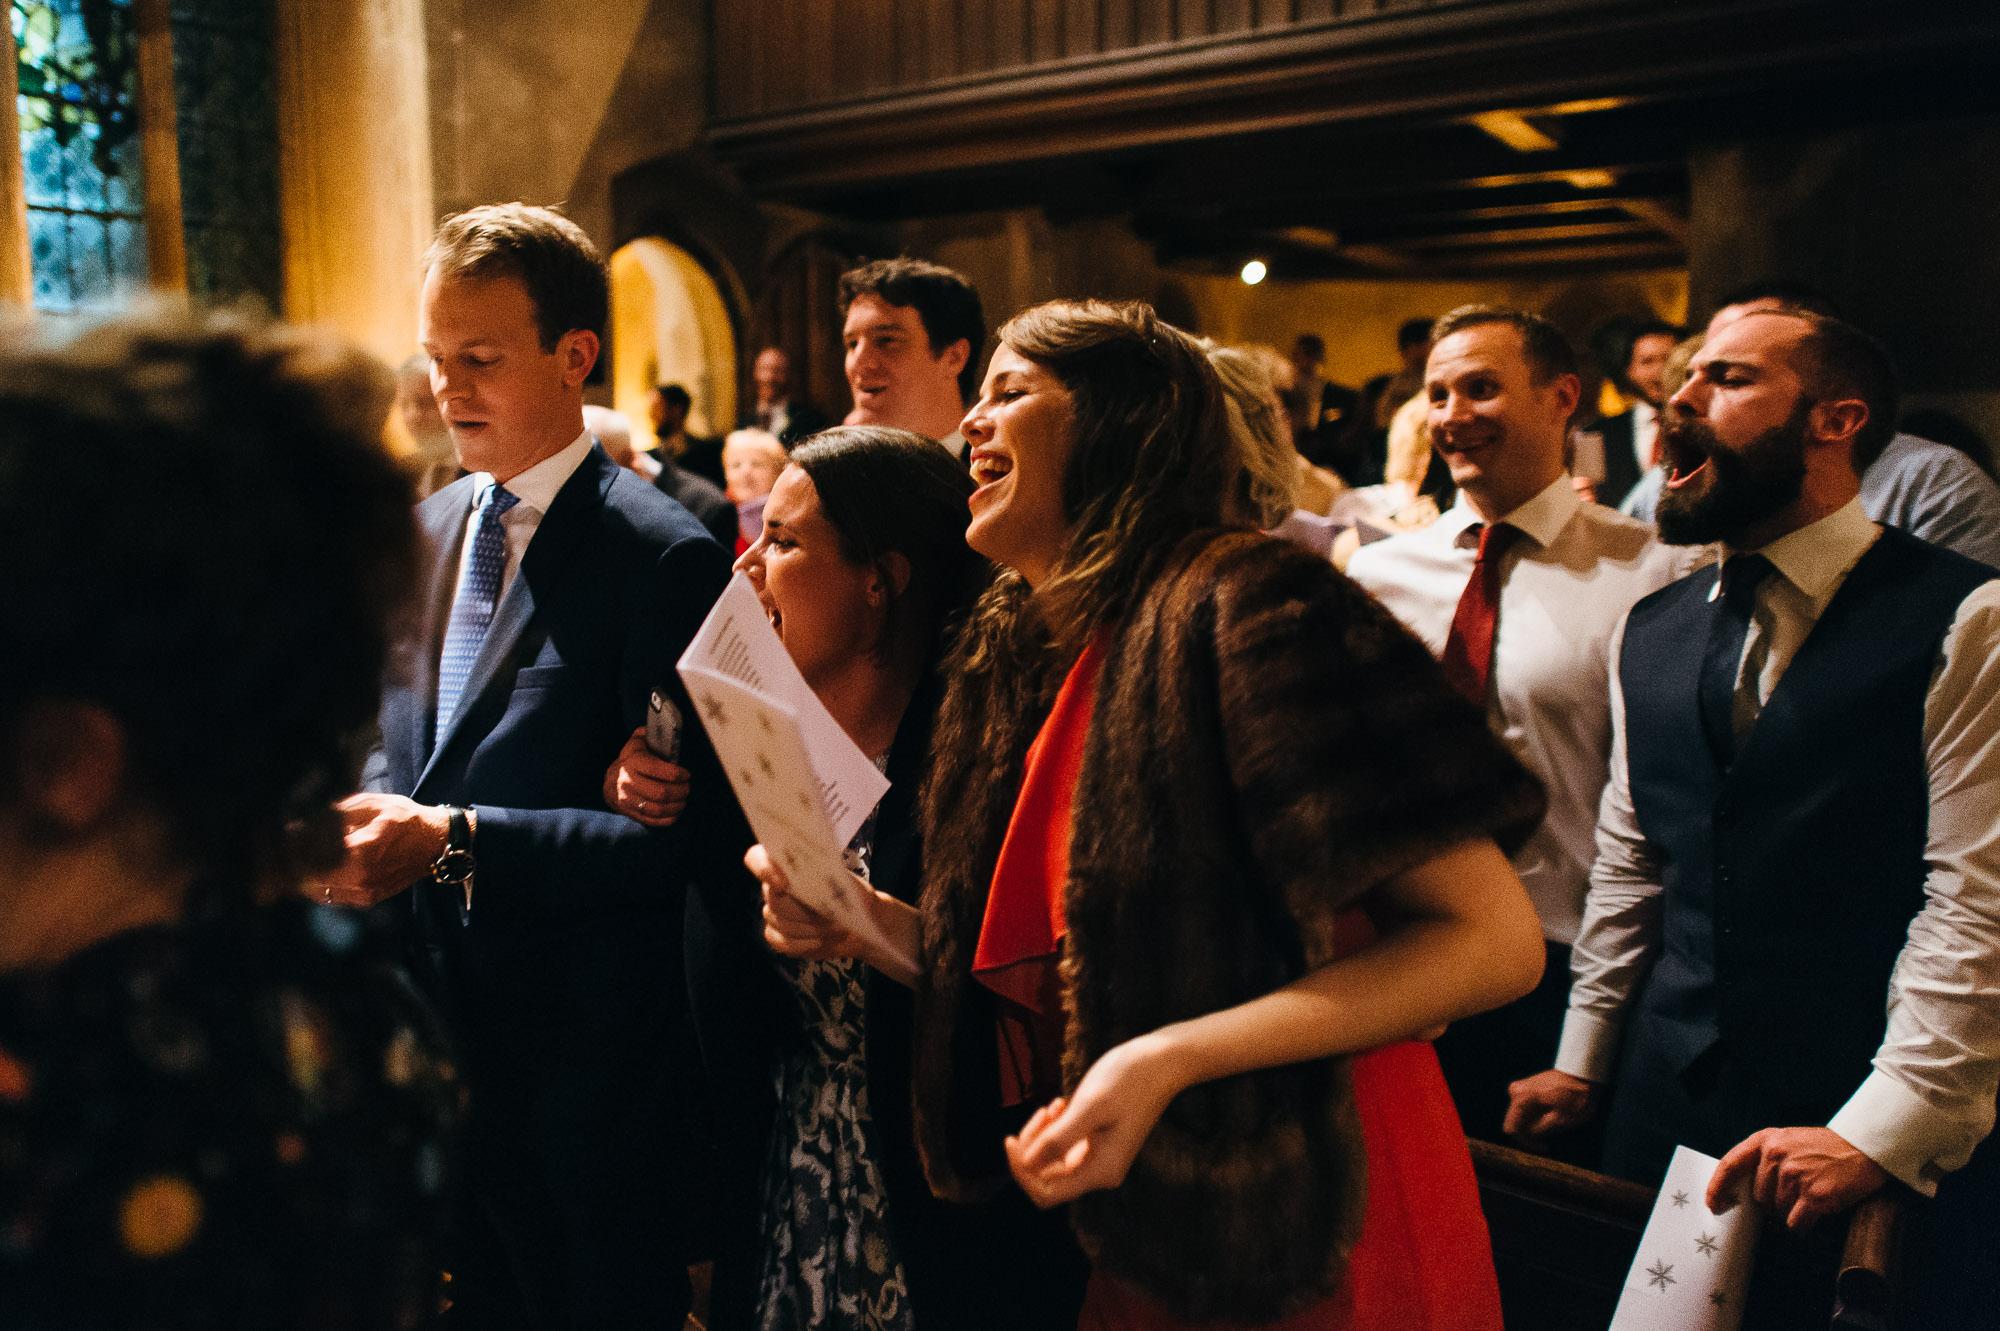 Hengrave hall winter wedding reception